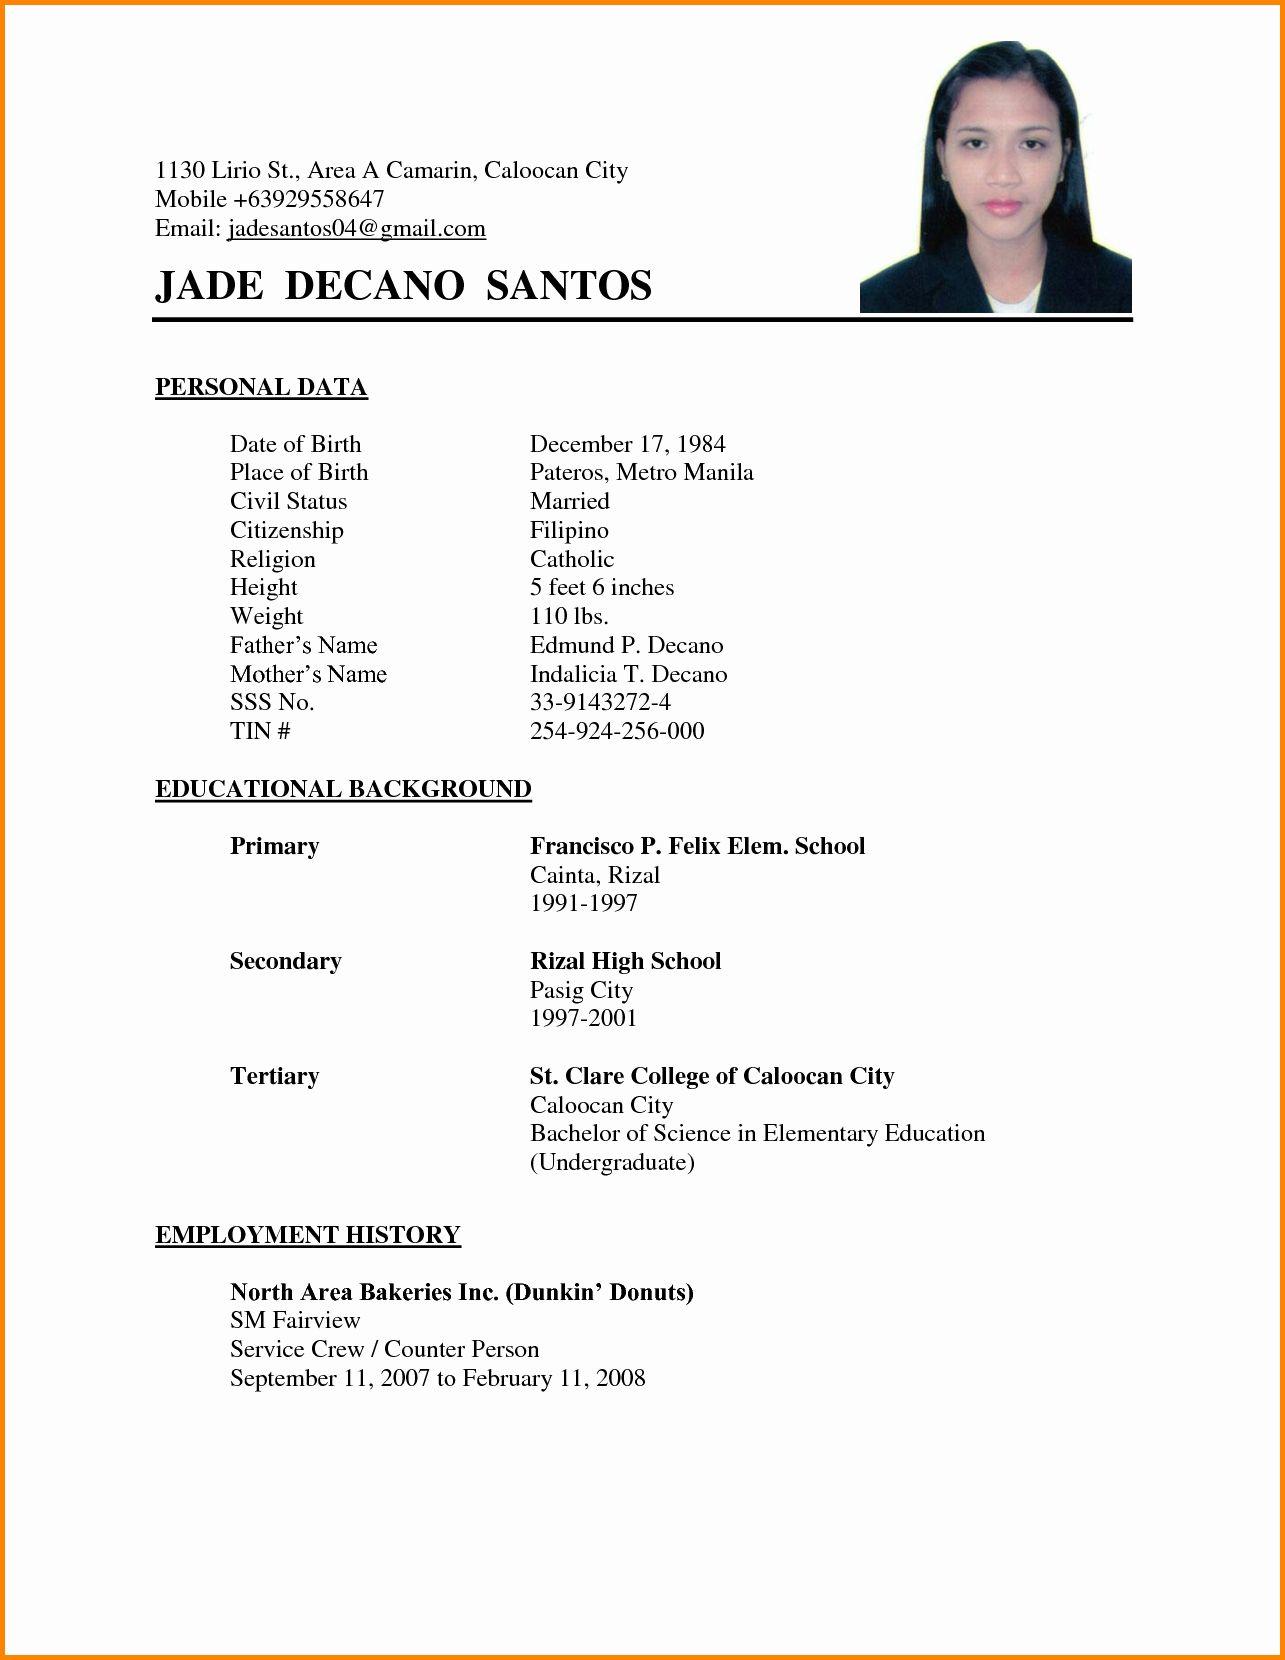 Samples Of A Basic Resume Elegant Resume Examples Philippines Resume Ixiplay Free Resume Sample In 2020 Sample Resume Format Simple Resume Format Basic Resume Examples